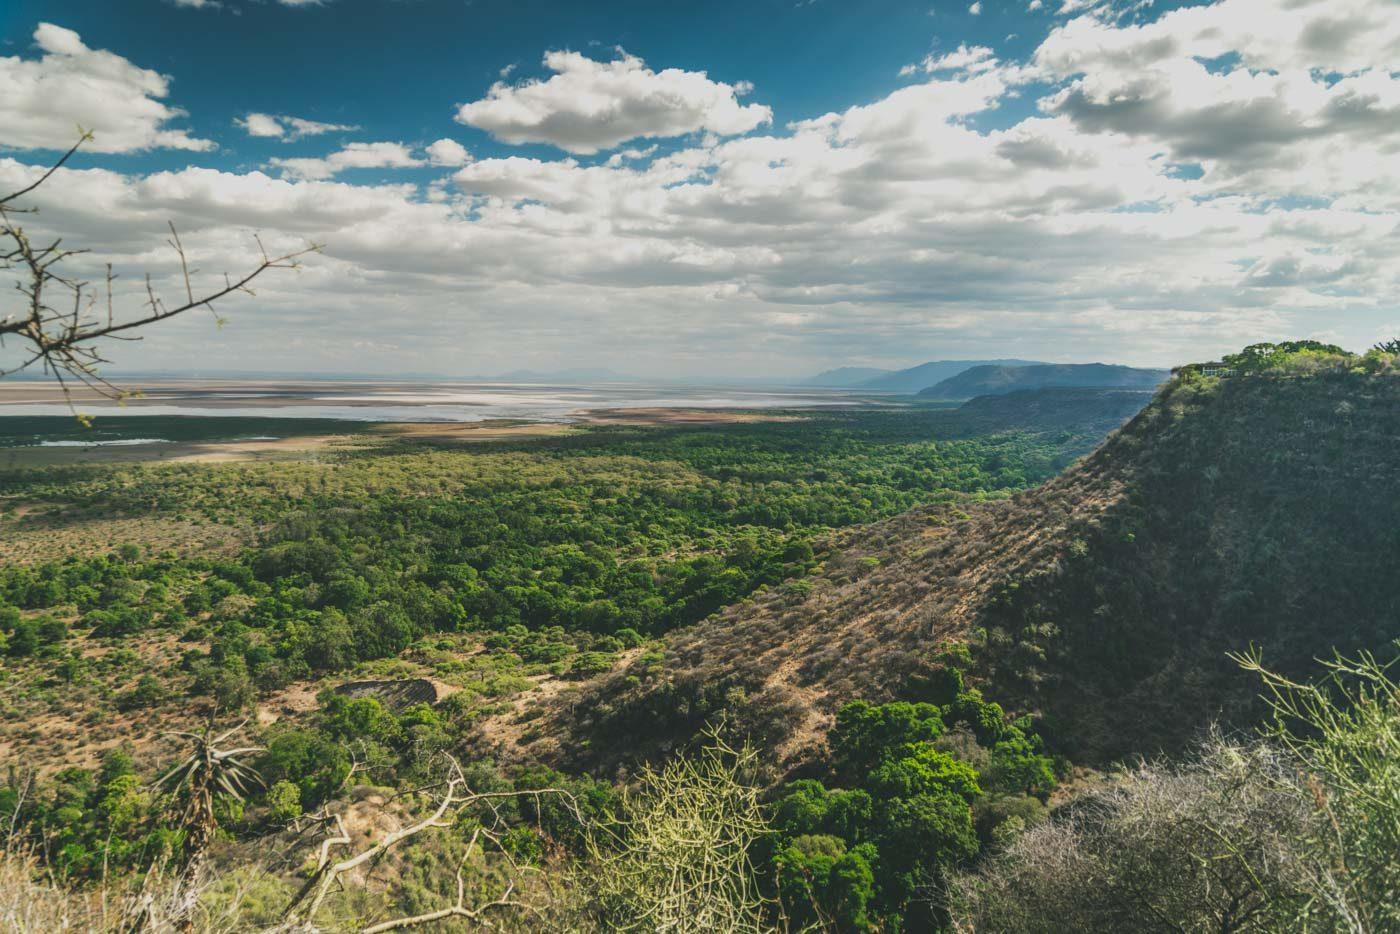 Safari in Tanzania: Lake Manyara National Park, Tanzania